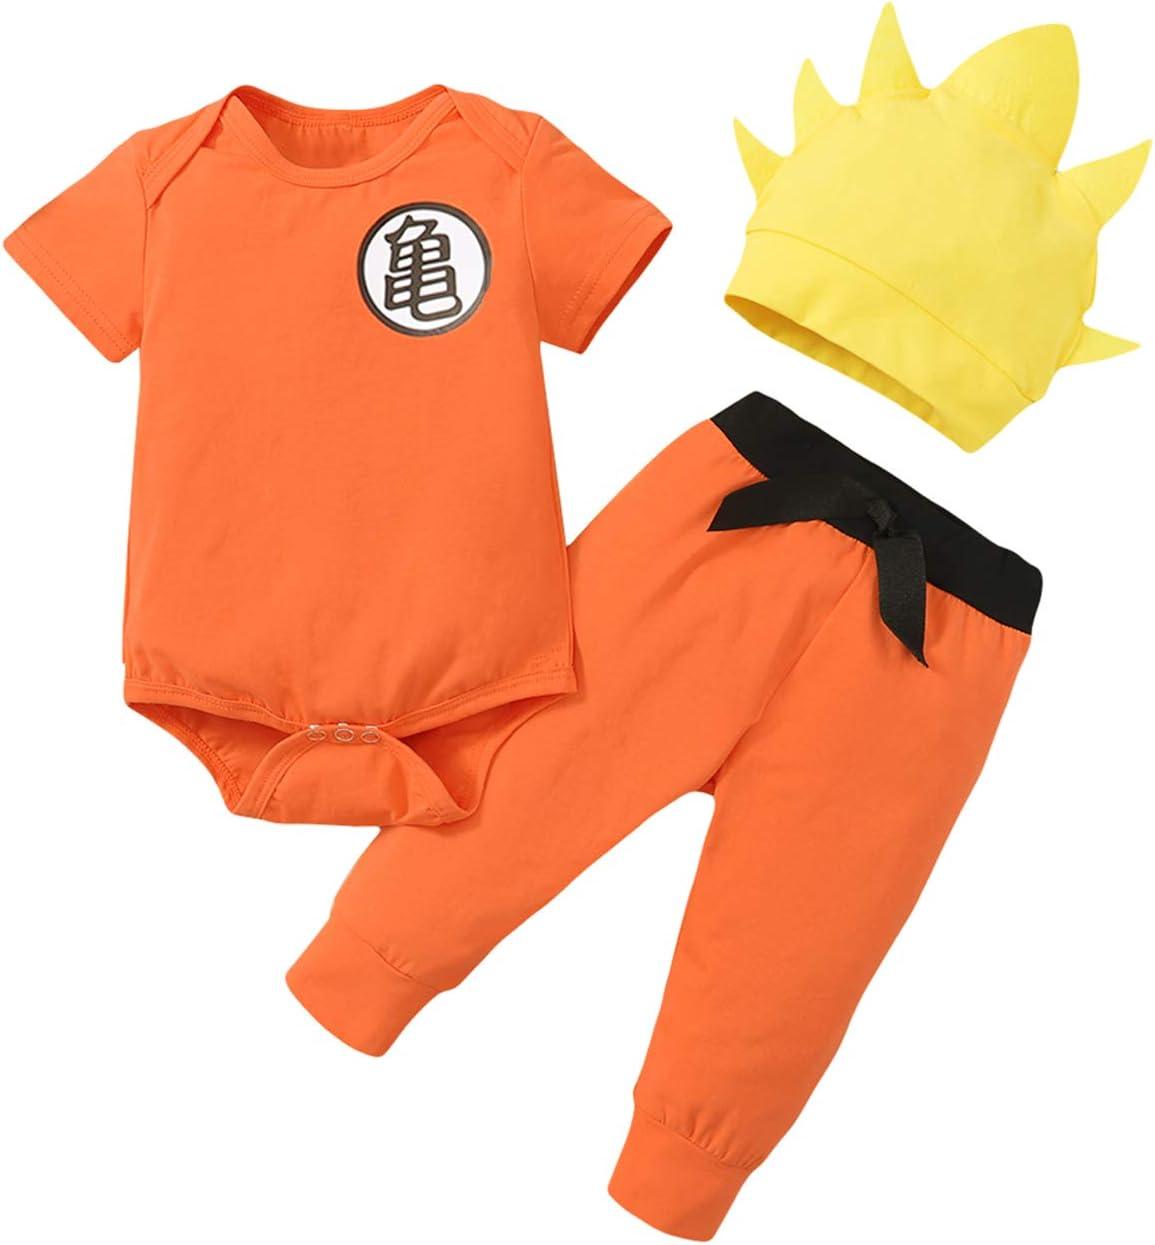 Singcoco Baby San Antonio Mall Goku Outfit Orang Boy New York Mall Costume